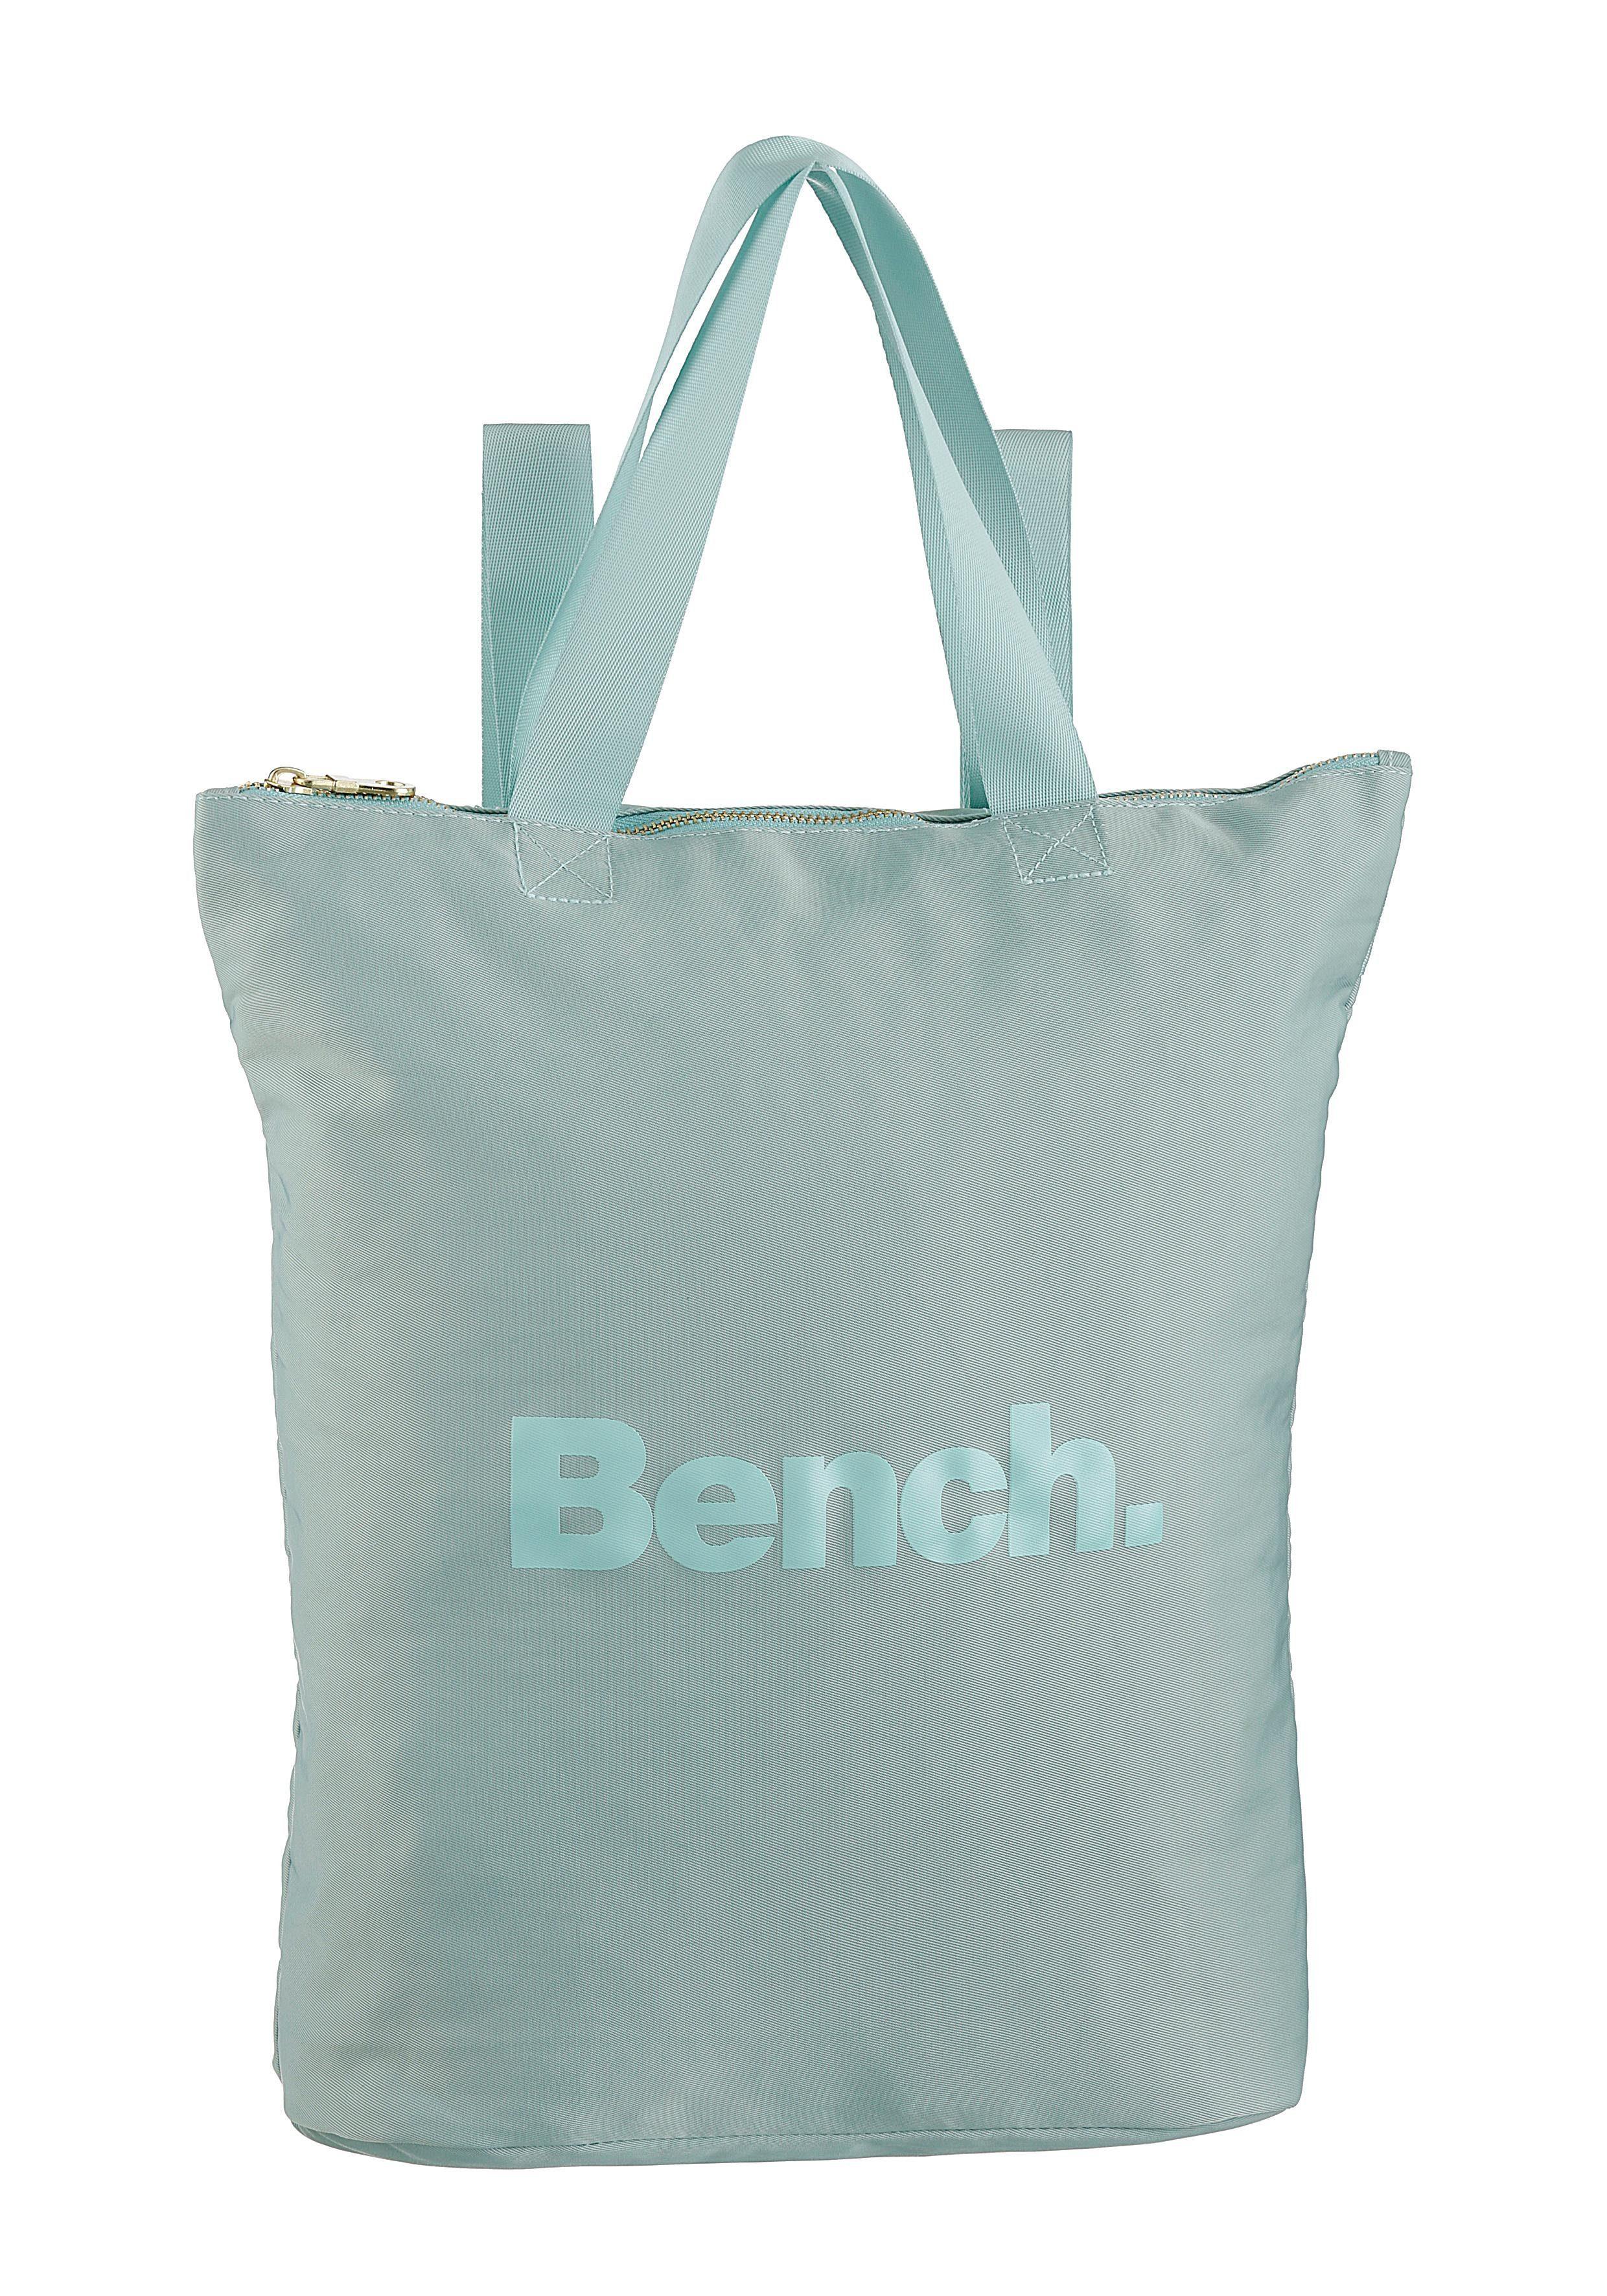 Image of Bench. Cityrucksack